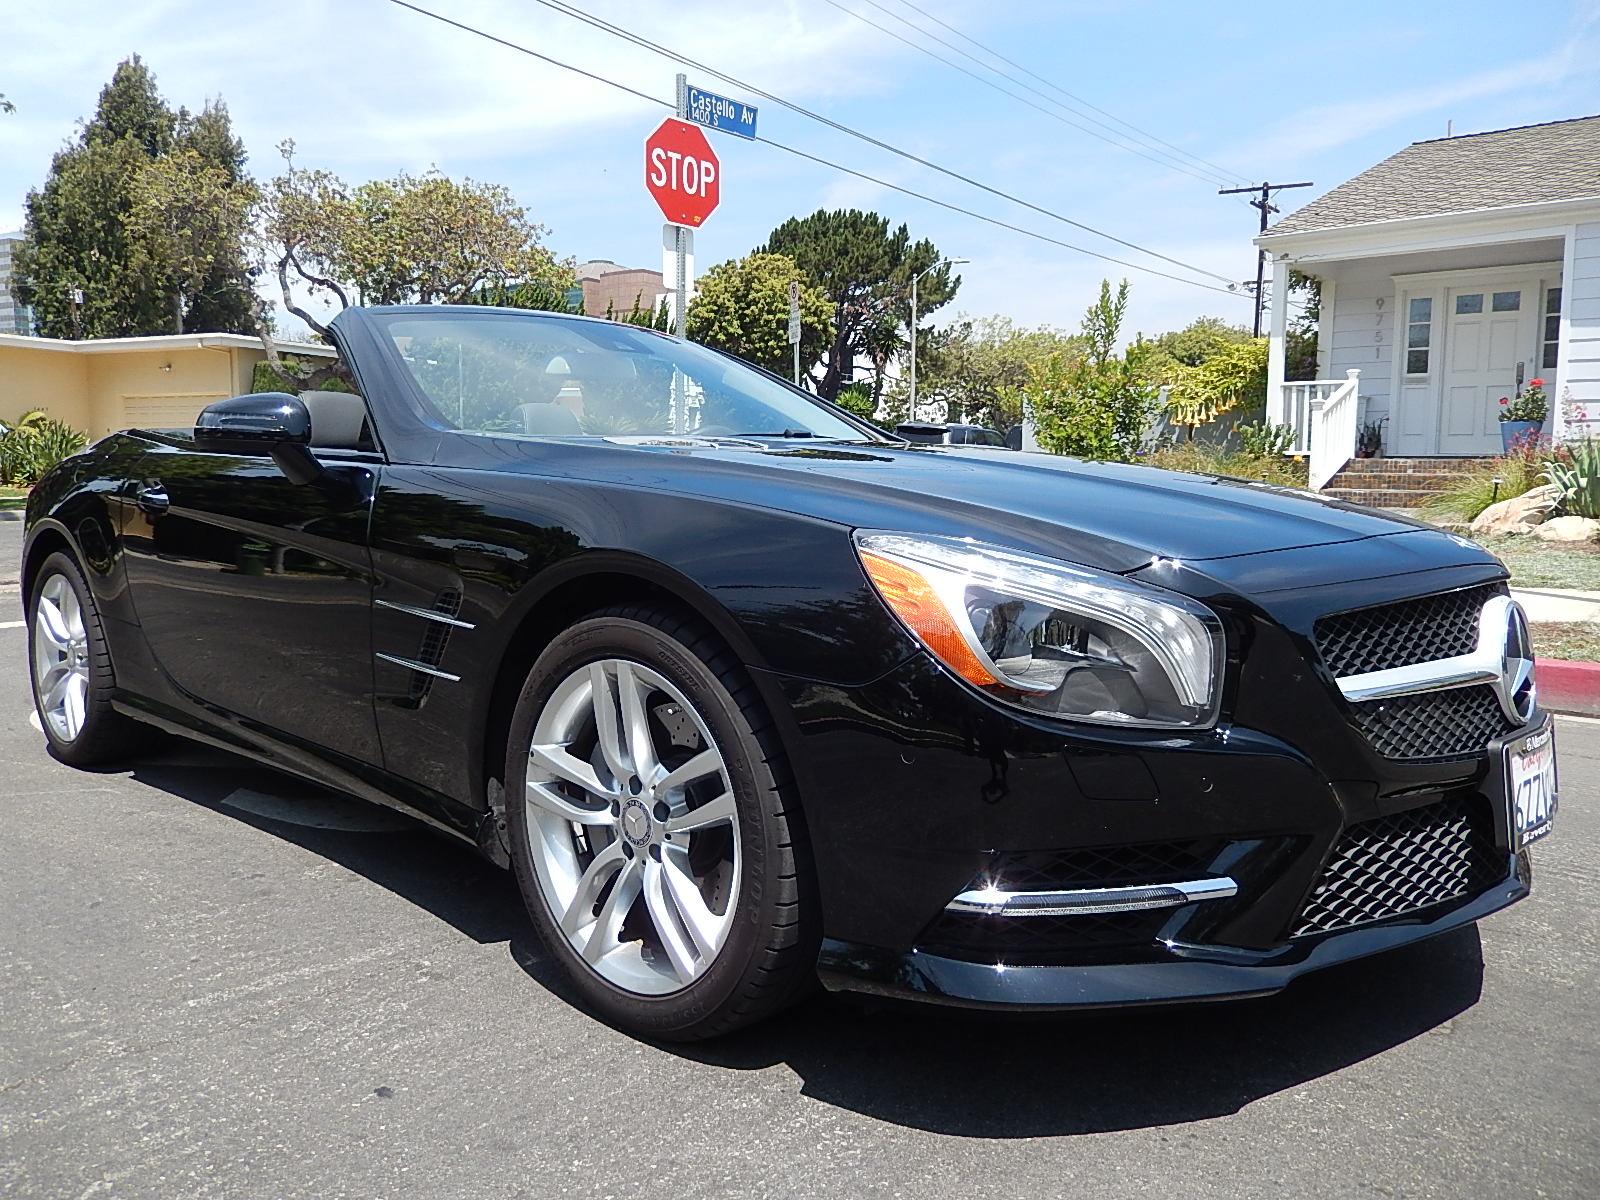 2014 mercedes benz sl550 roadster rental in los angeles for Mercedes benz rental los angeles